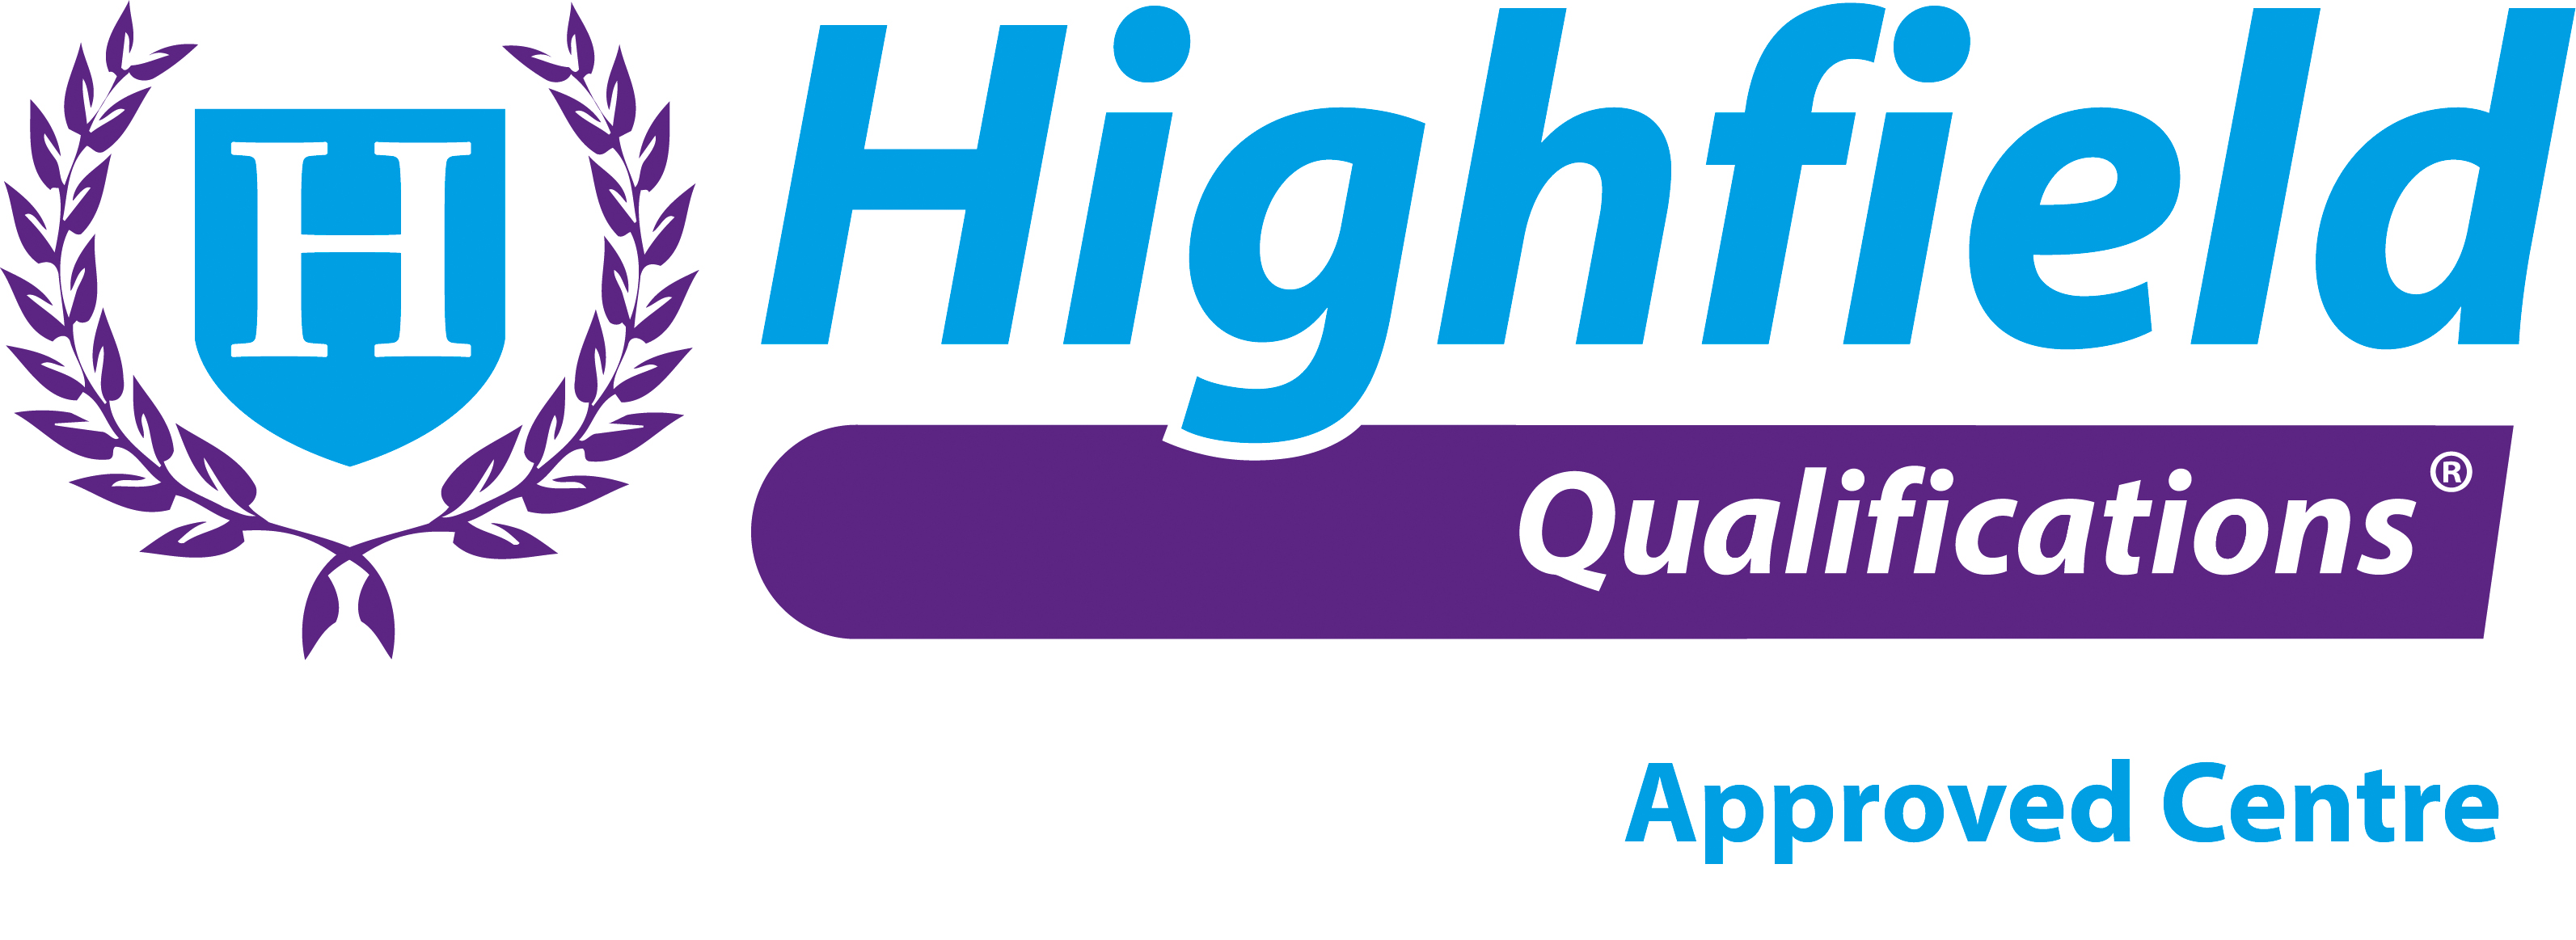 Highfields qualifications